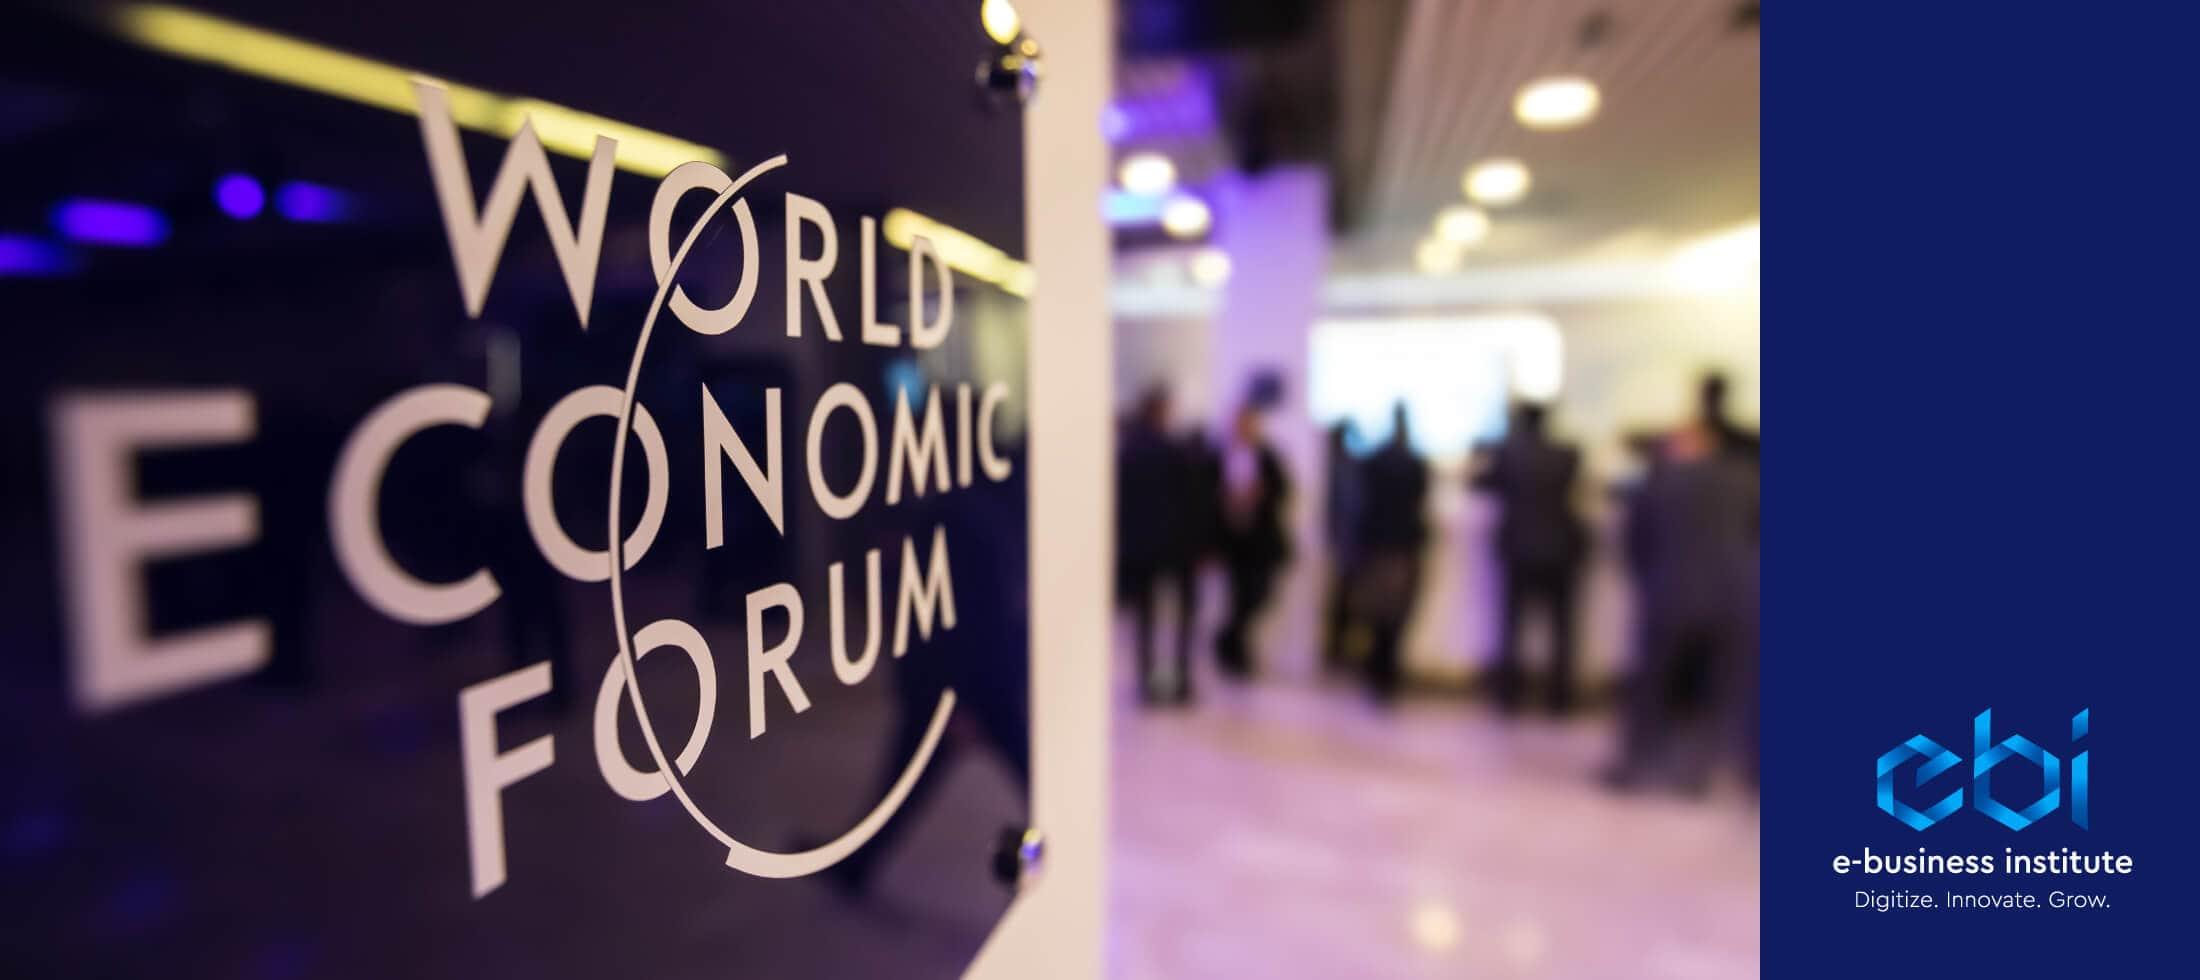 Luigi Matrone is among the experts at Davos 2020 Hero Image